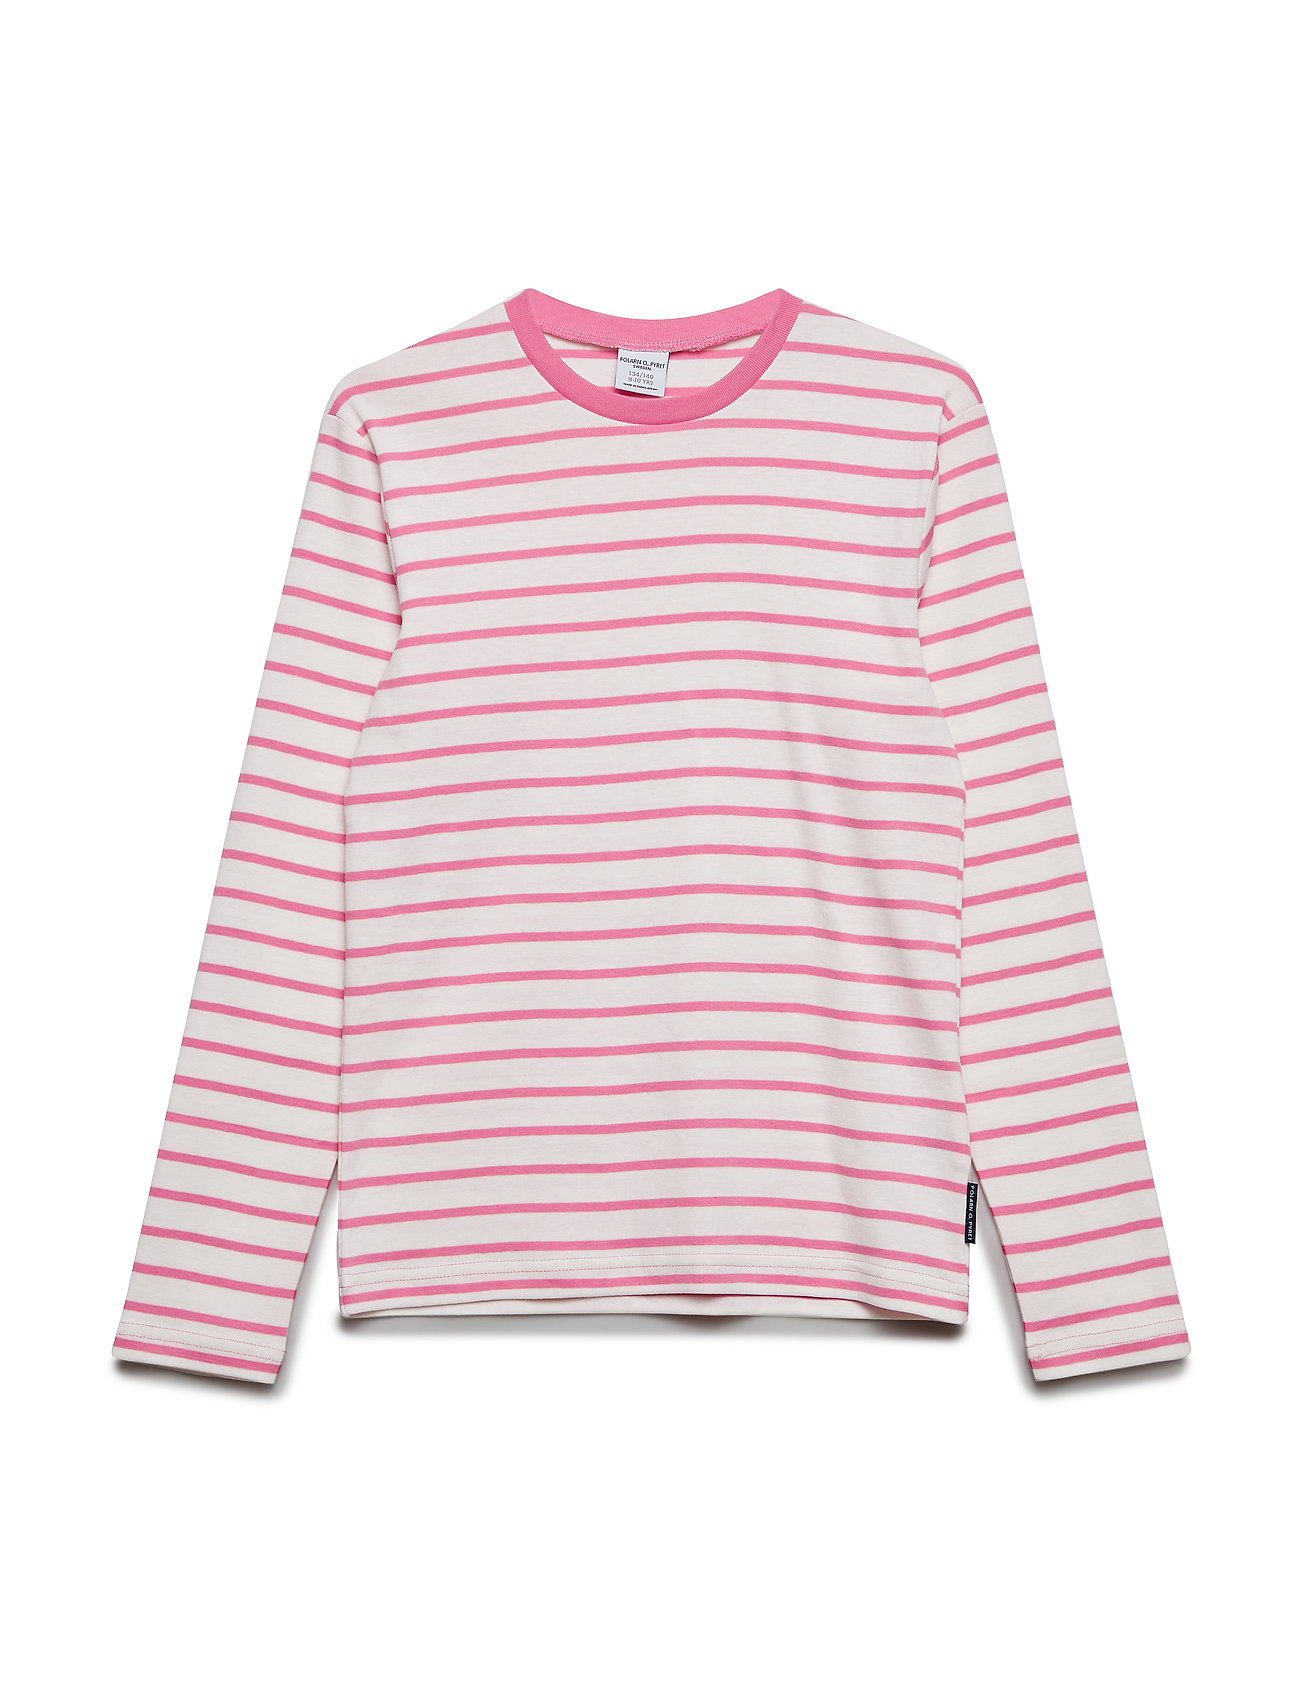 Polarn O. Pyret T-shirt Long Sleeve stripe School